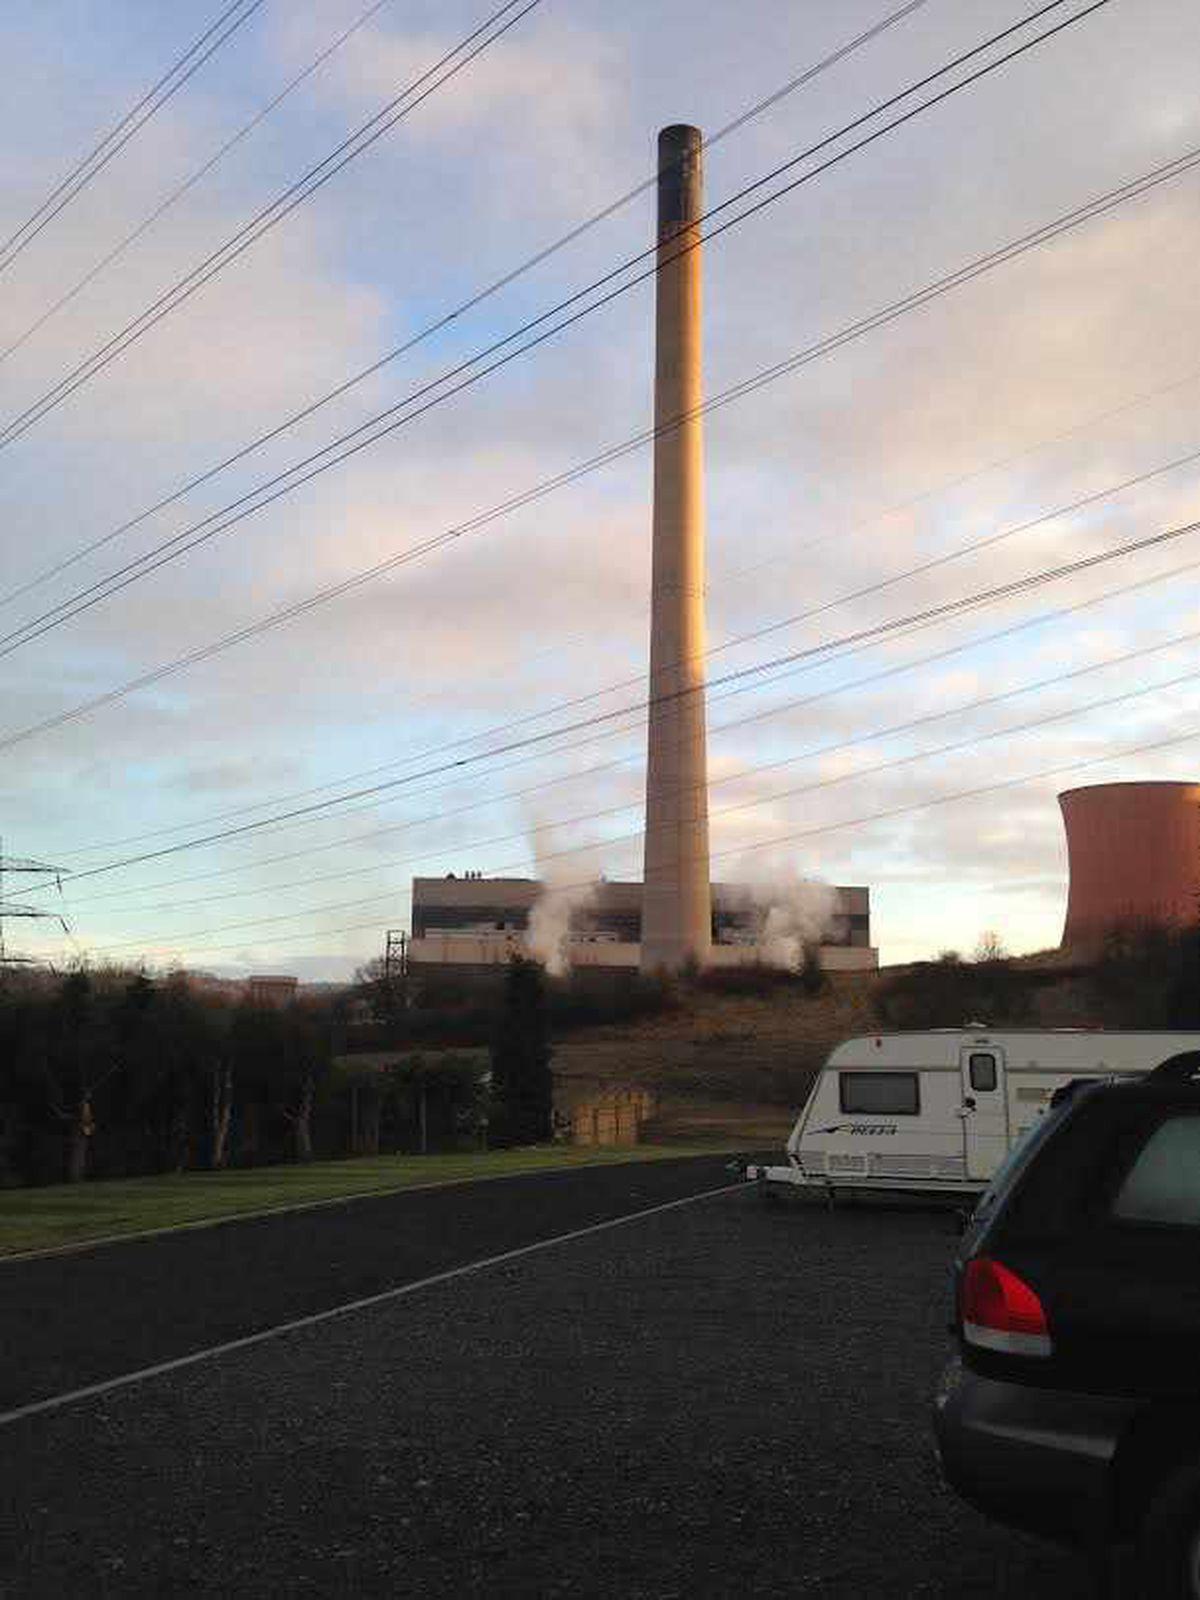 The chimney at Ironbridge Power Station